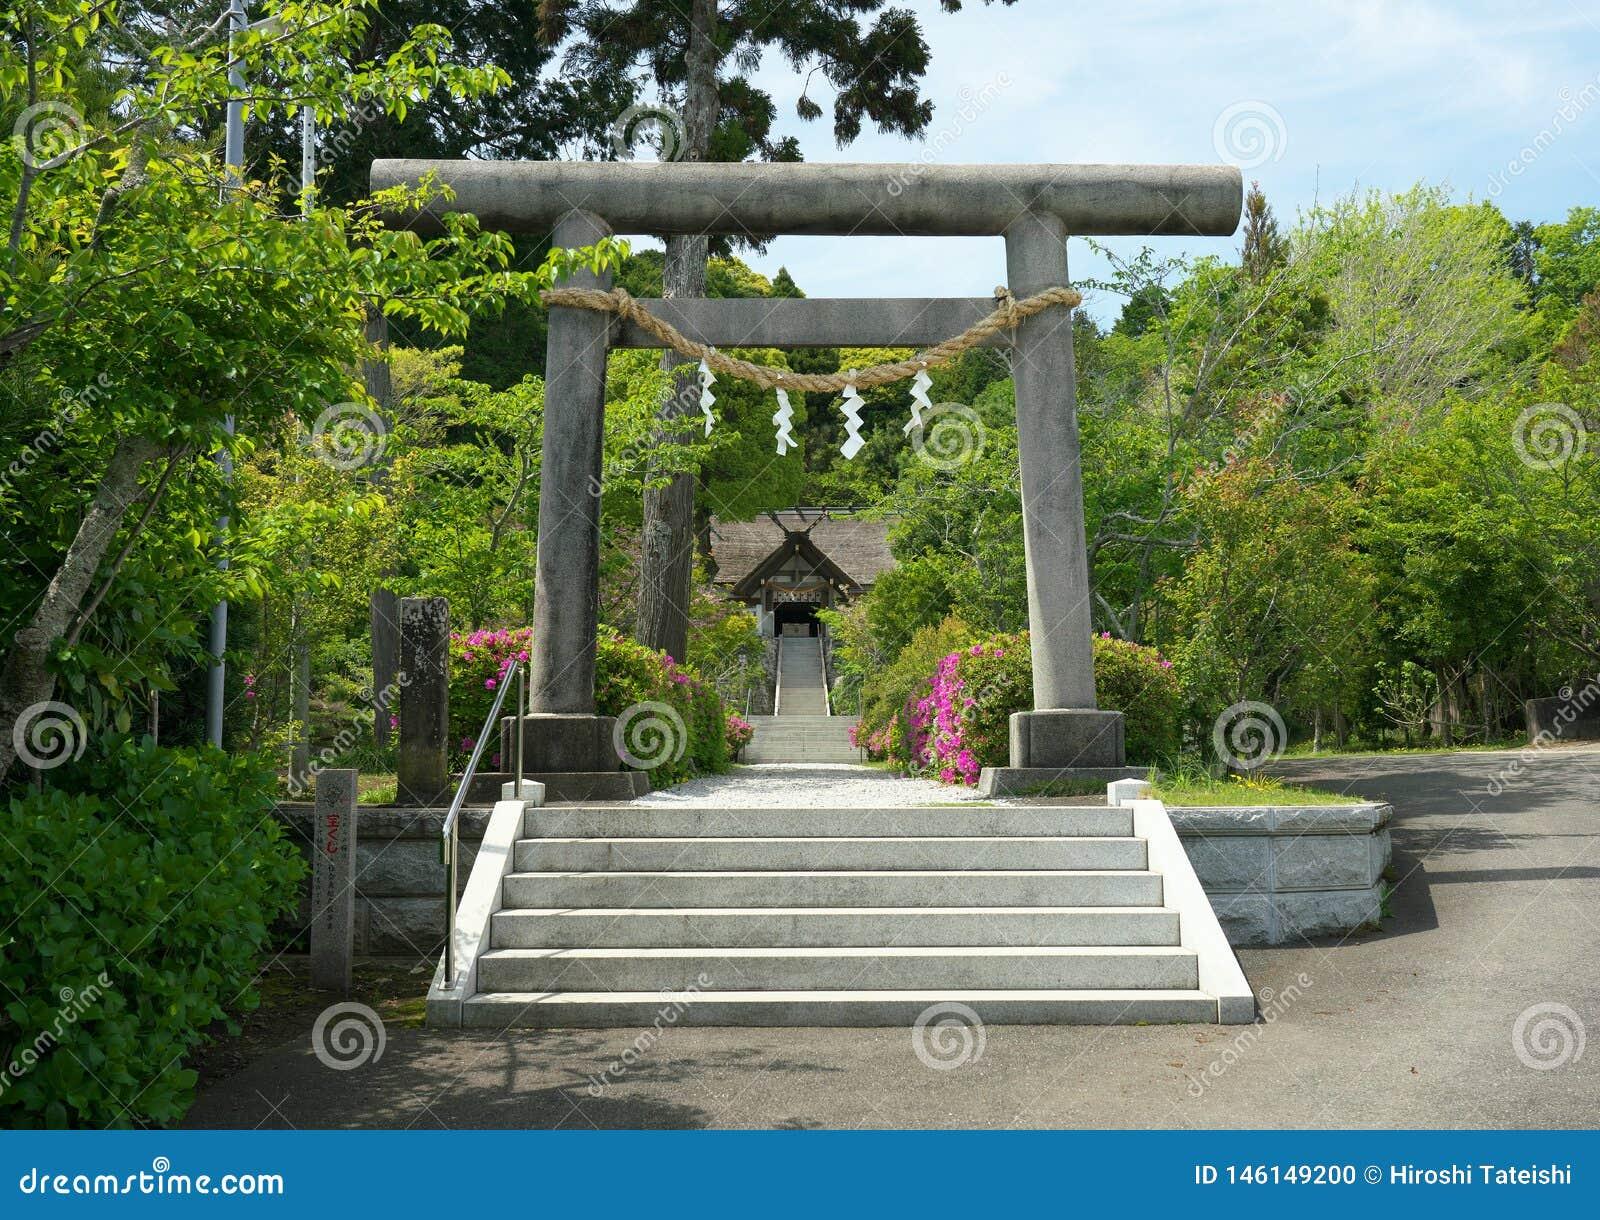 Takabeheiligdom in de prefectuur van Chiba, Japan Het enige shintoheiligdom in het worshiping koken van Japan en kitch